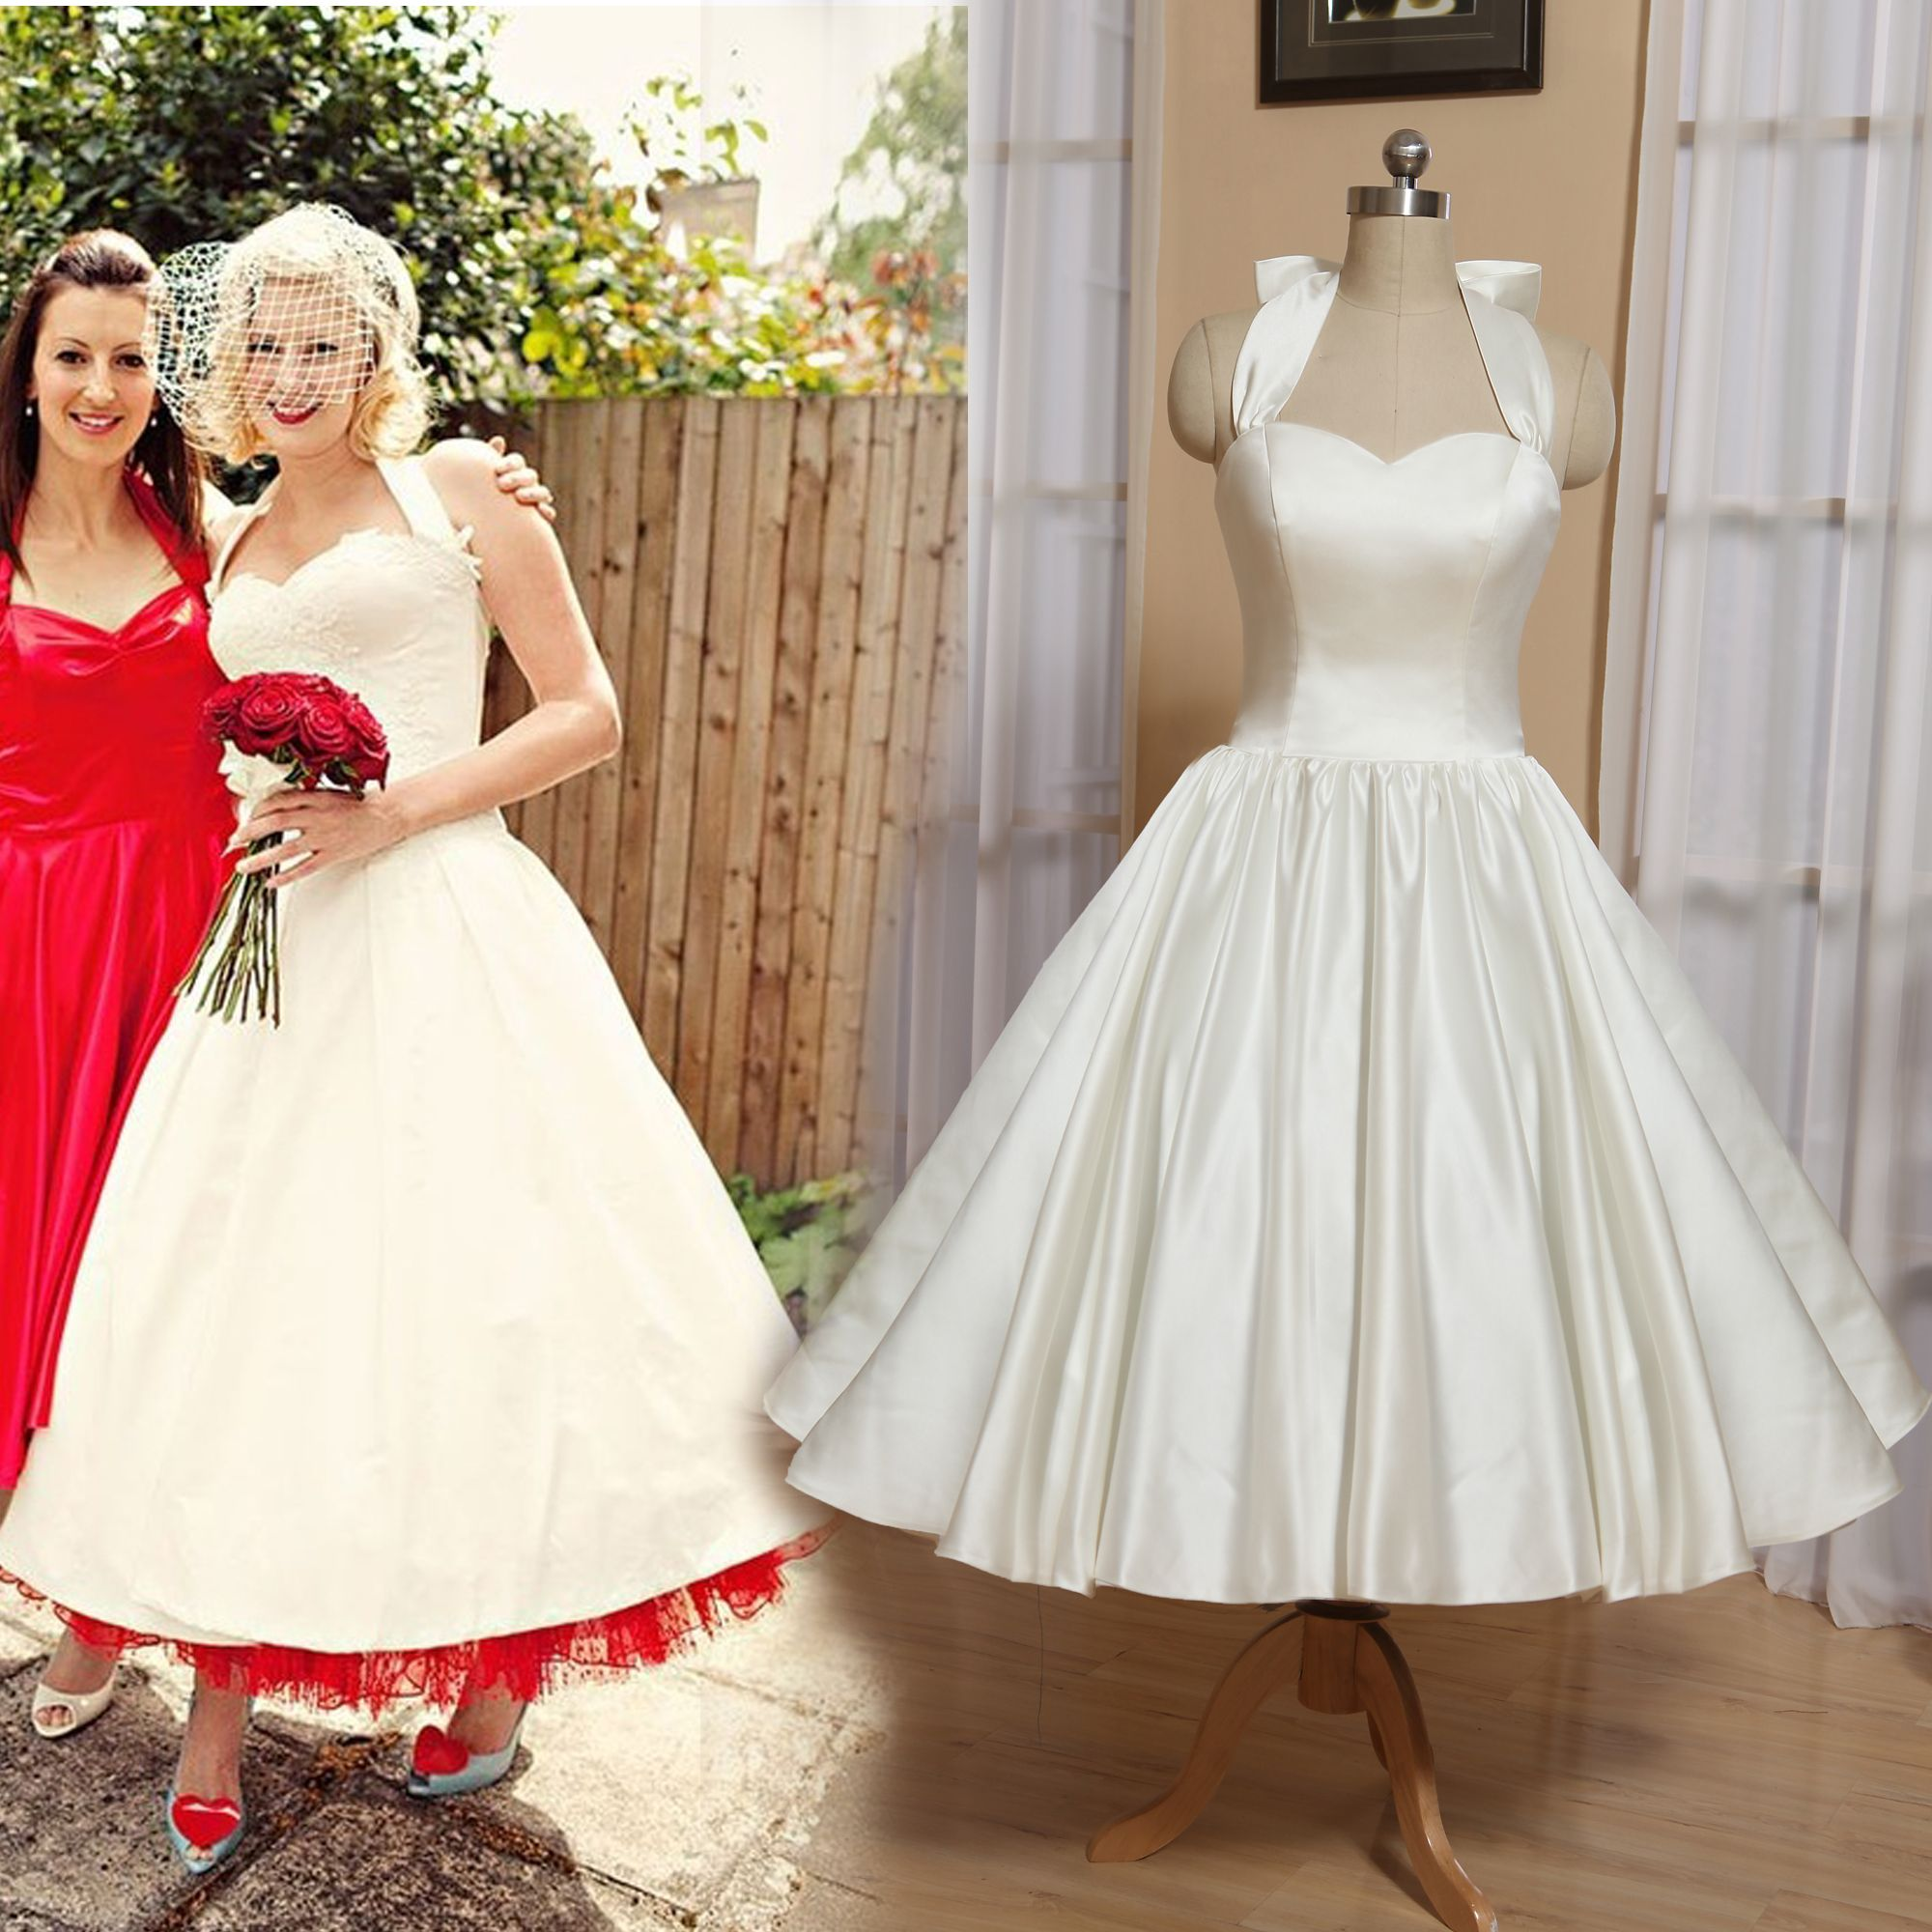 Short Wedding Dresses 50s Wedding Dress Garden Tea Length Bridal Gowns Halter Neck Vintage Inspired Wedd Wedding Dresses 50s Lace Bridal Gown Bow Wedding Dress [ 2000 x 2000 Pixel ]